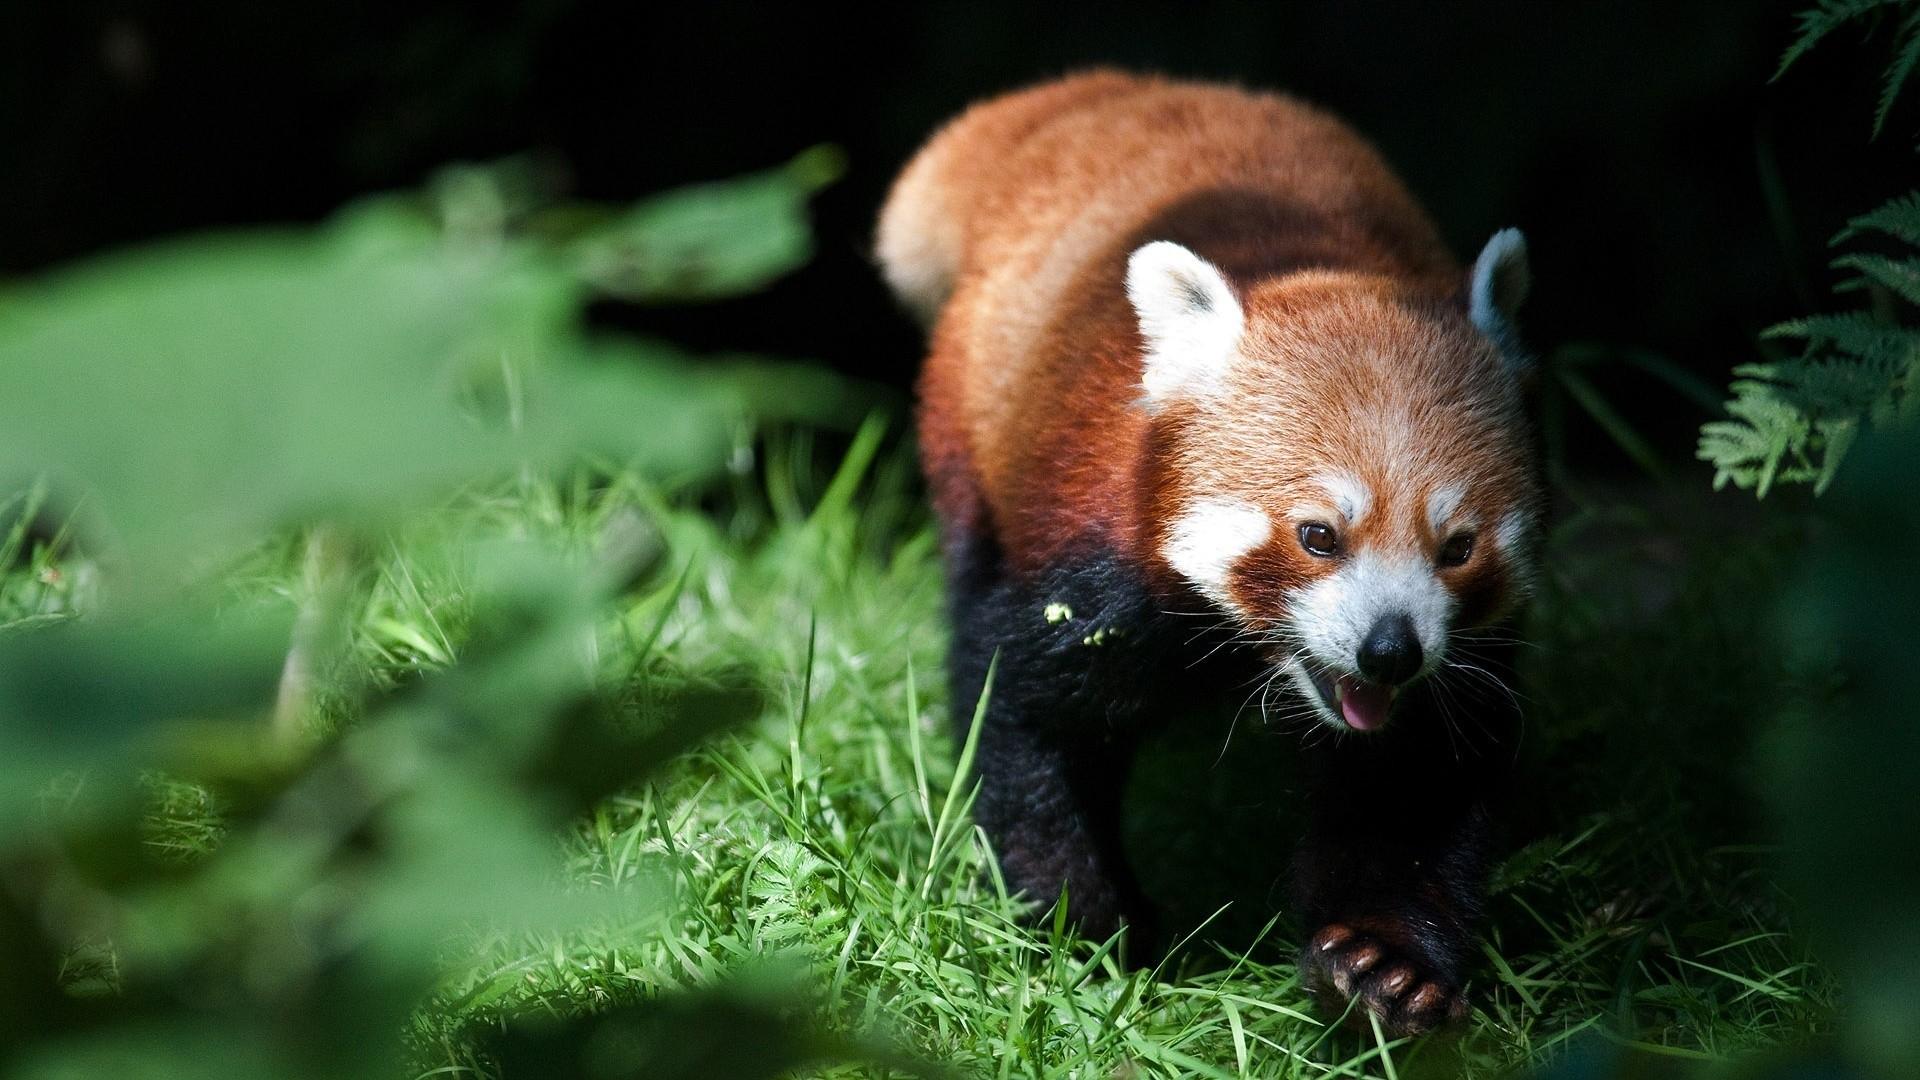 Download Wallpaper Red panda, Grass, Blurring .